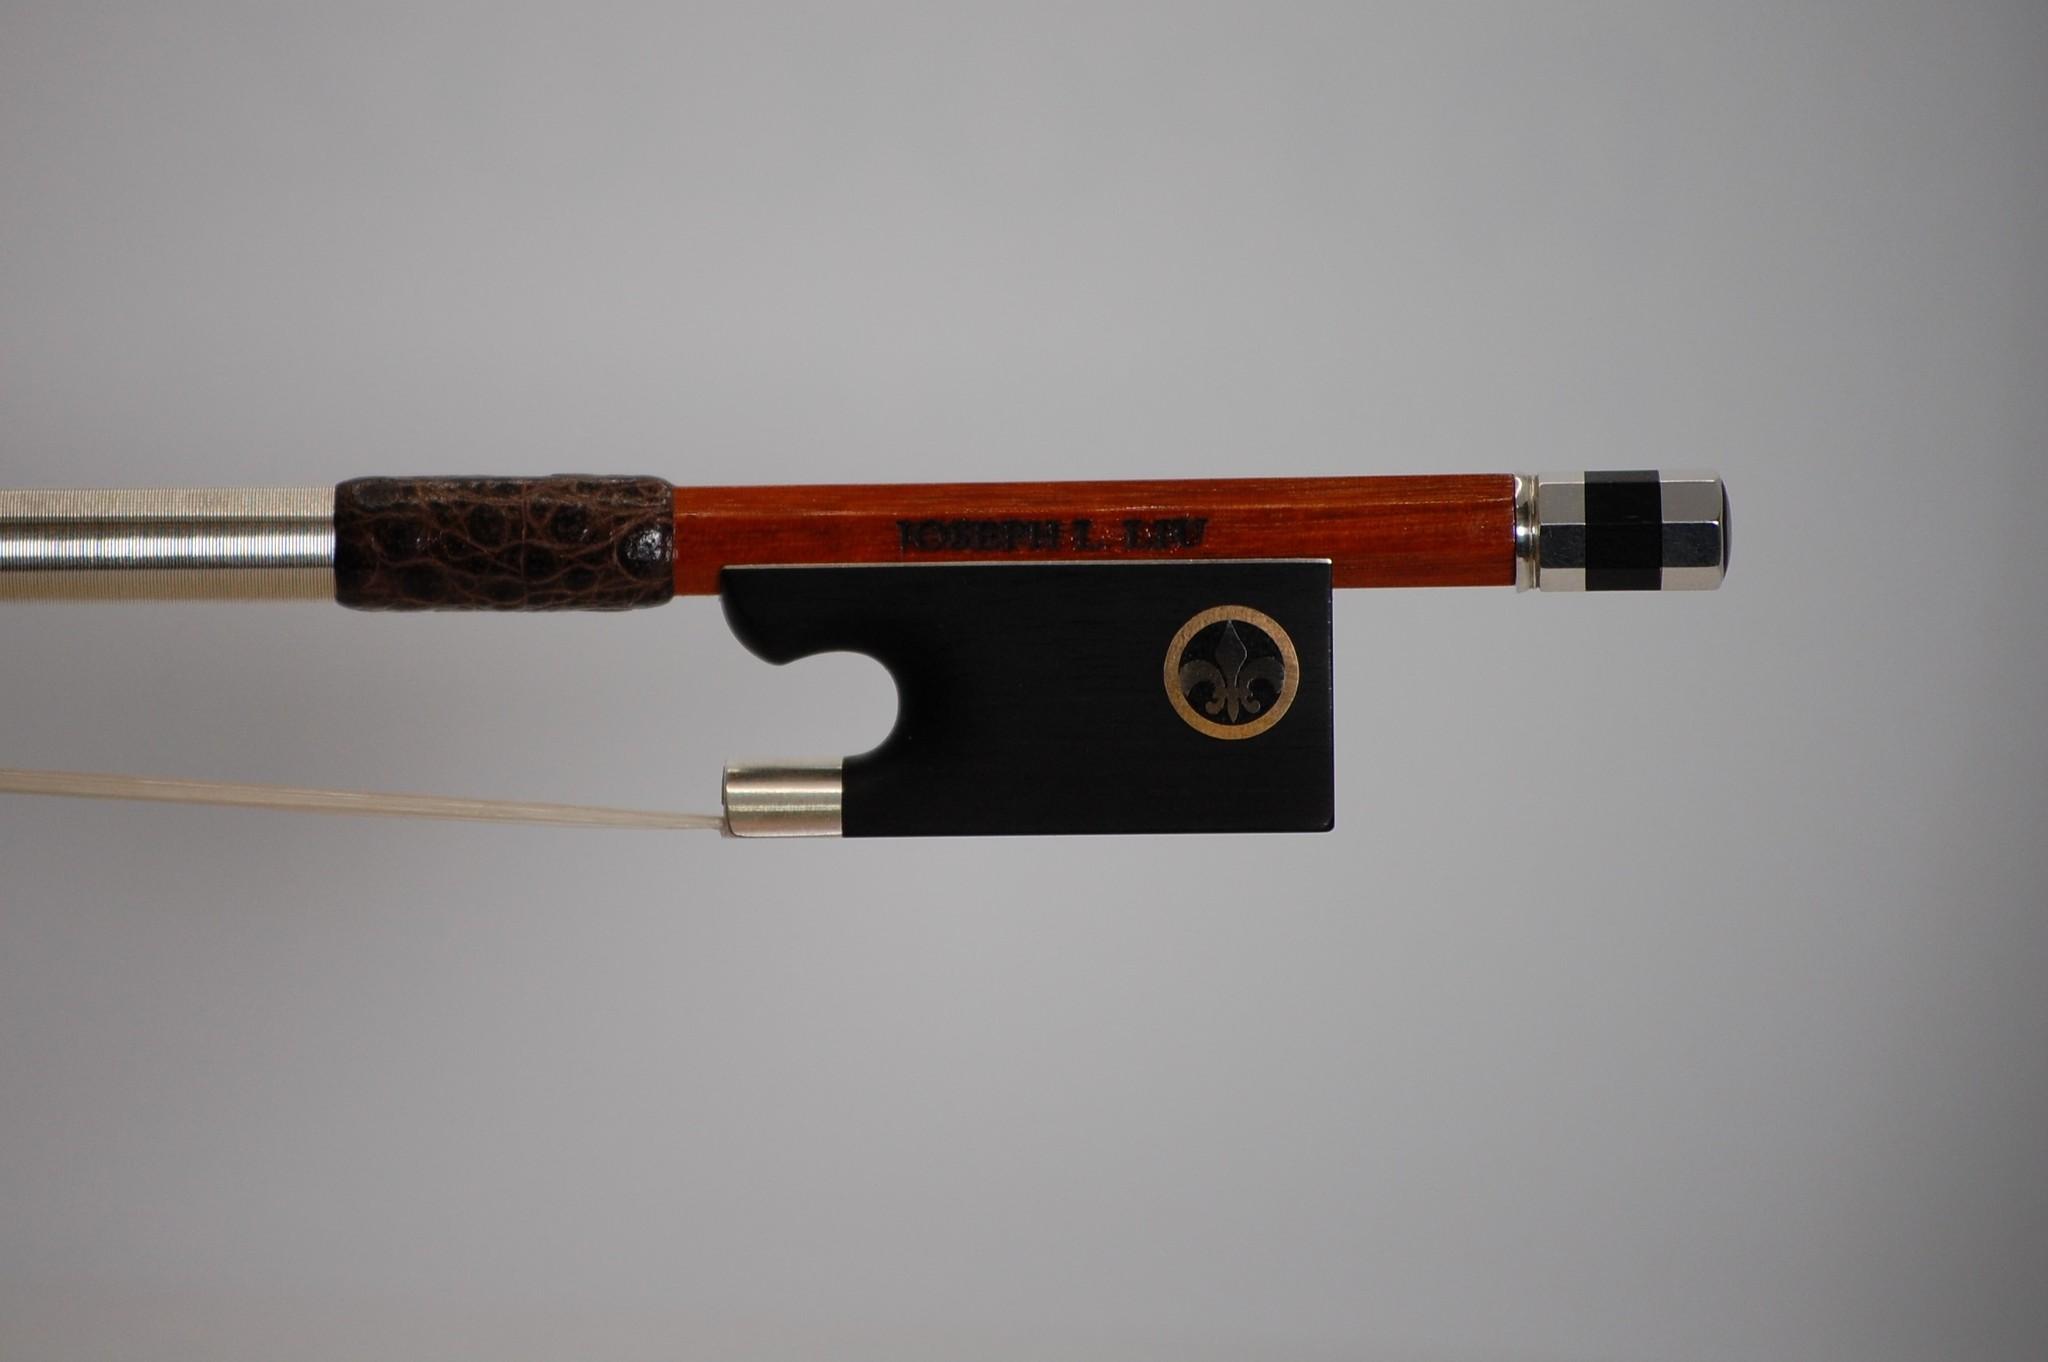 JOSEPH LIU violin bow, silver-mounted w/ brass/nickel Fleur de Lis, Kansas City USA